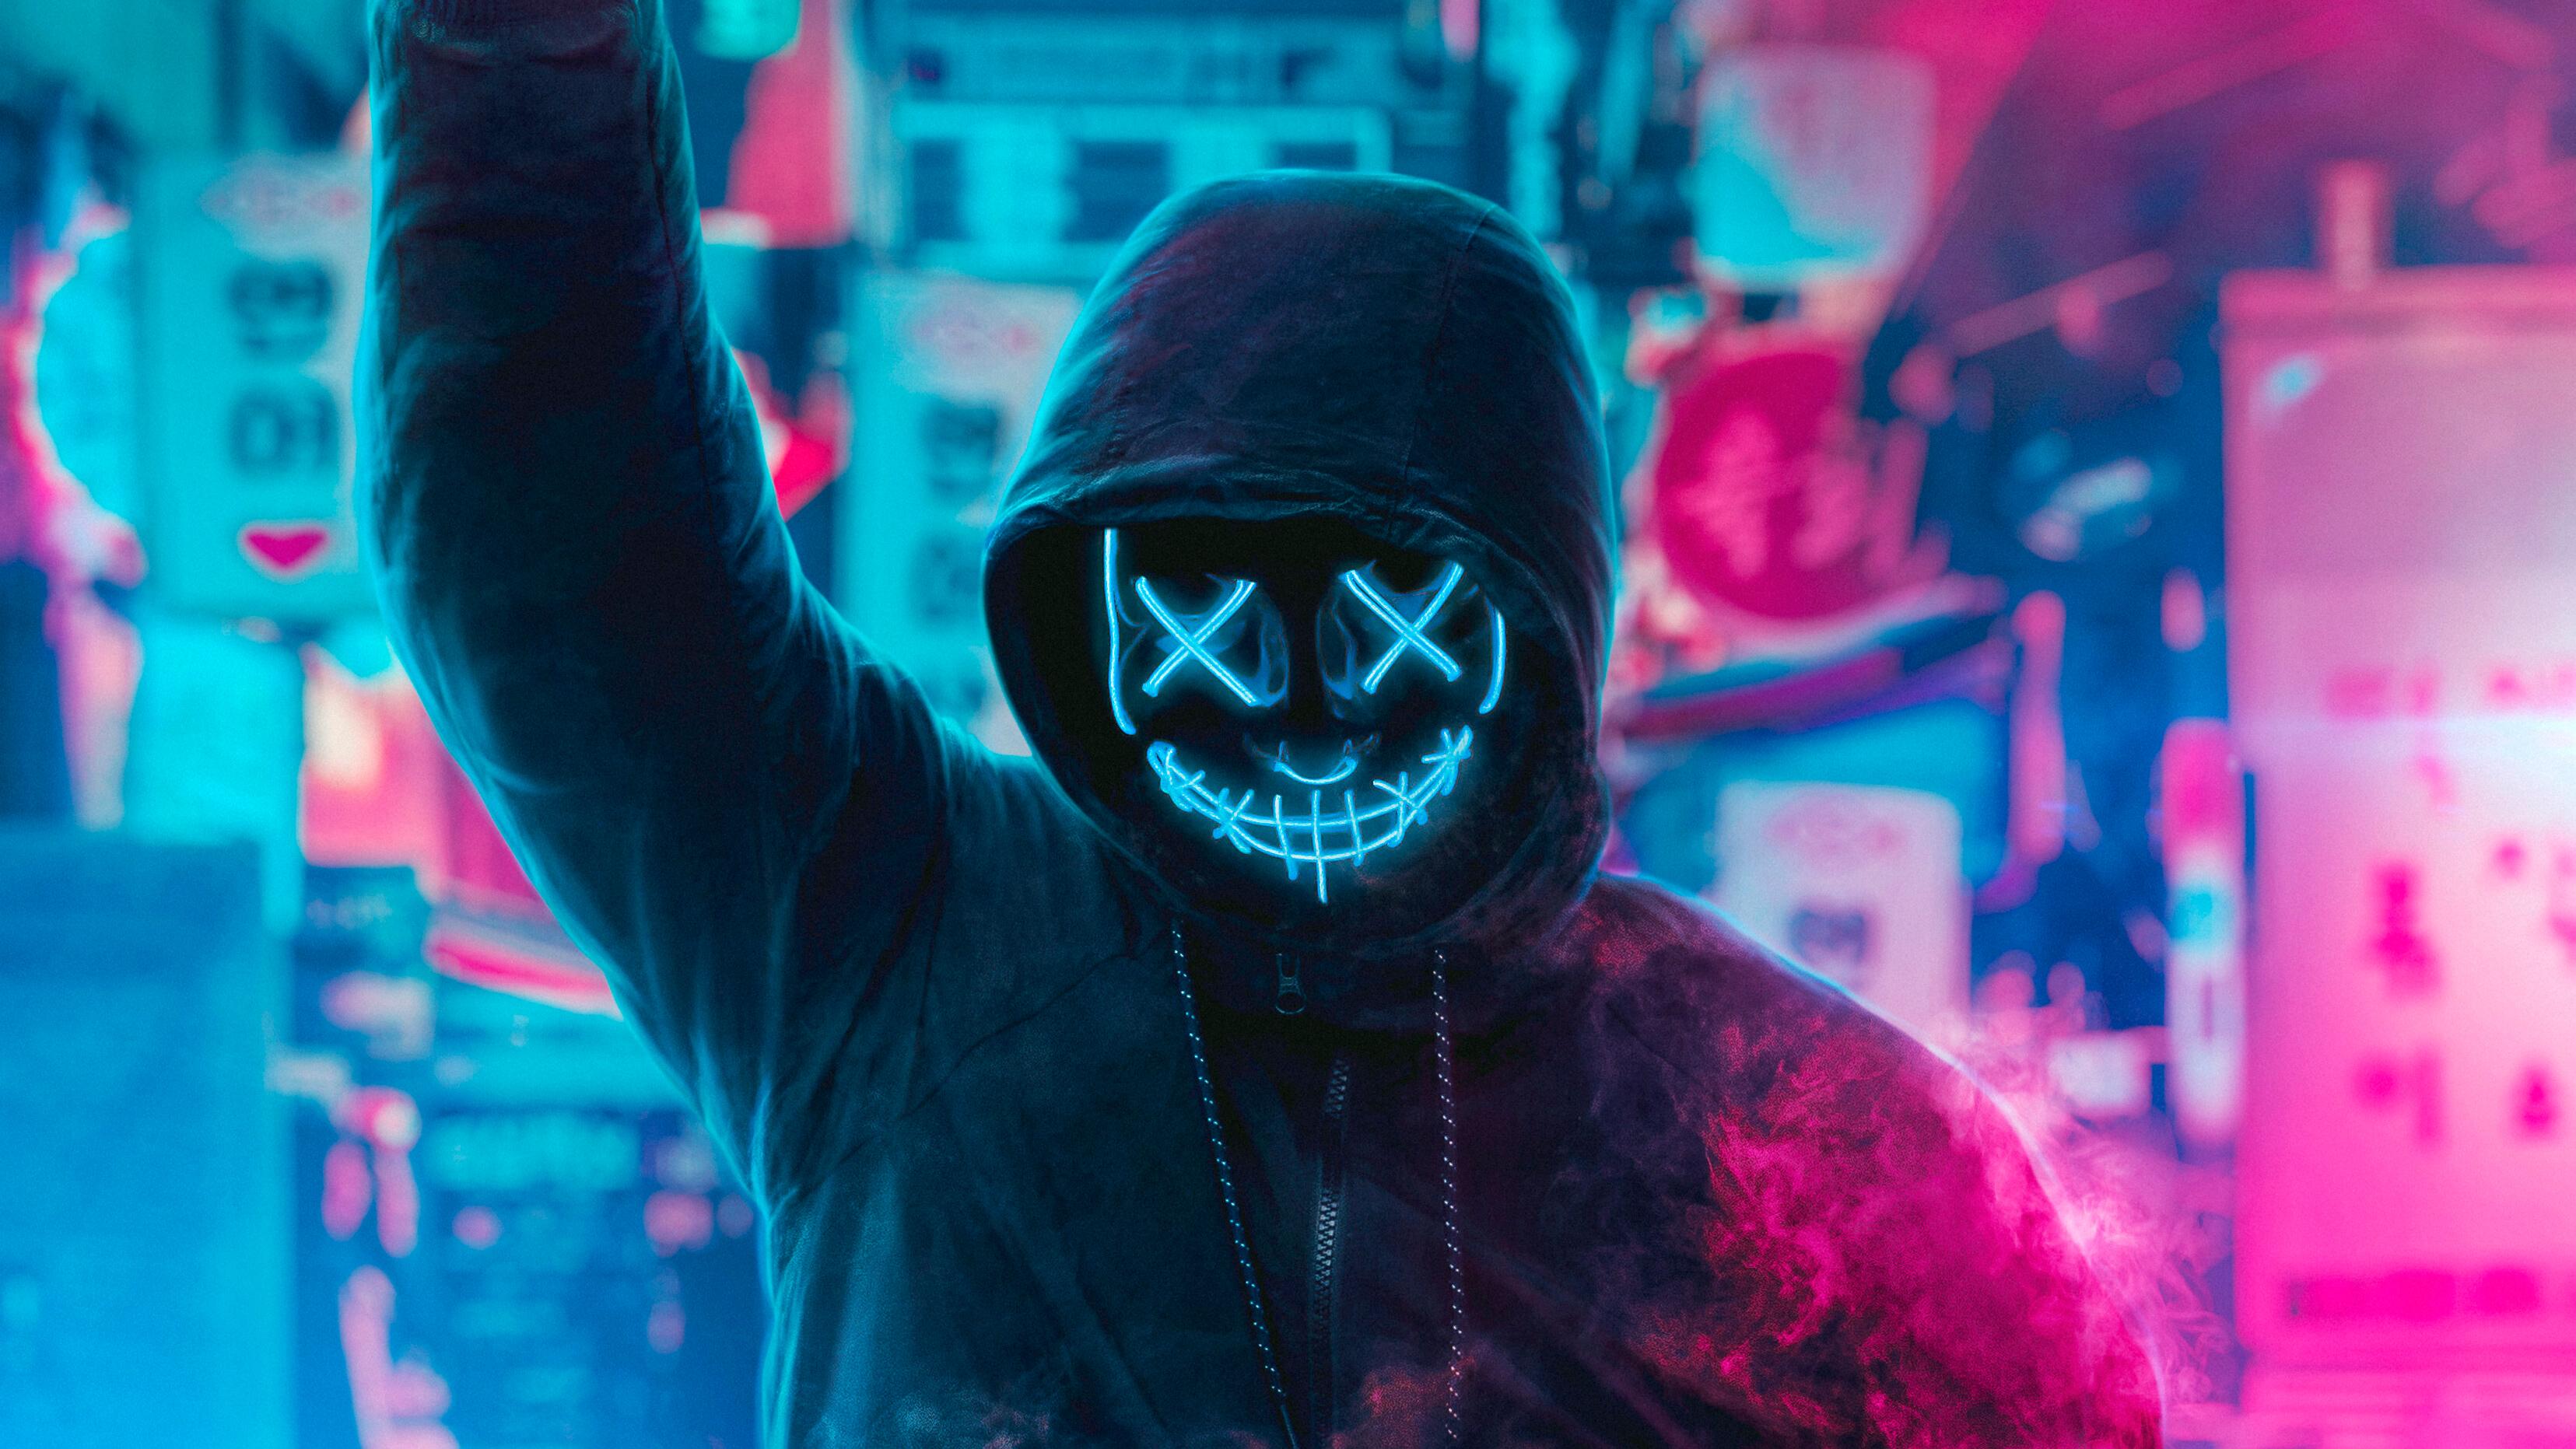 1280x1024 Mask Guy Neon Eye 1280x1024 Resolution HD 4k ...